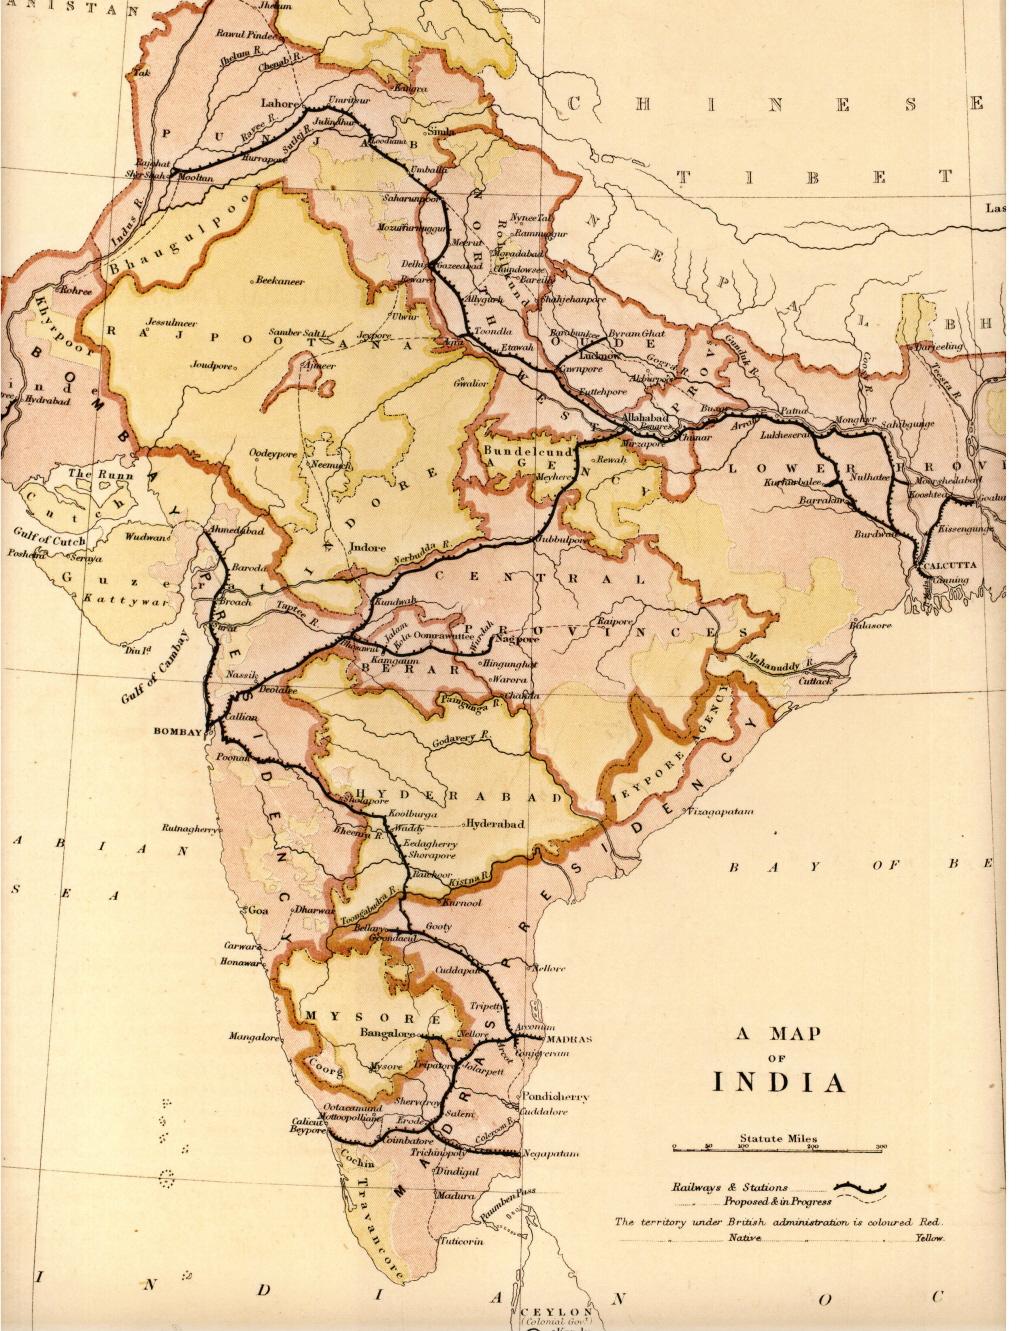 Indian railways httpuploadmediawikipediacommons559indianrailways1871bg gumiabroncs Image collections